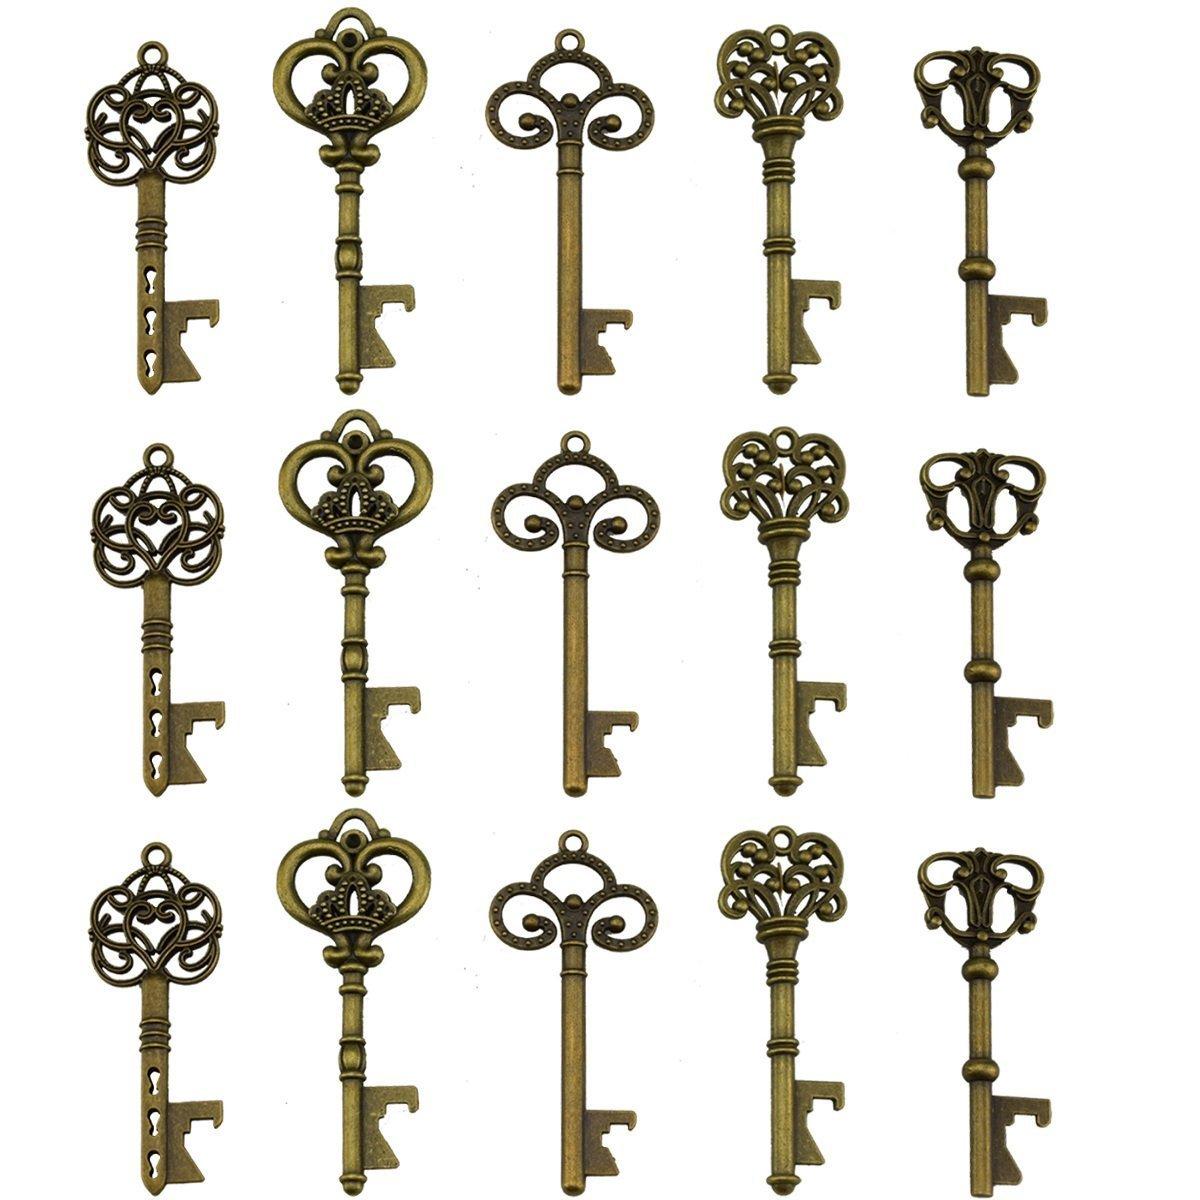 Portachiavi apribottiglie - assortiti vintage Skeleton Keys, matrimonio, feste, confezione da 70, bronzo) EVINIS